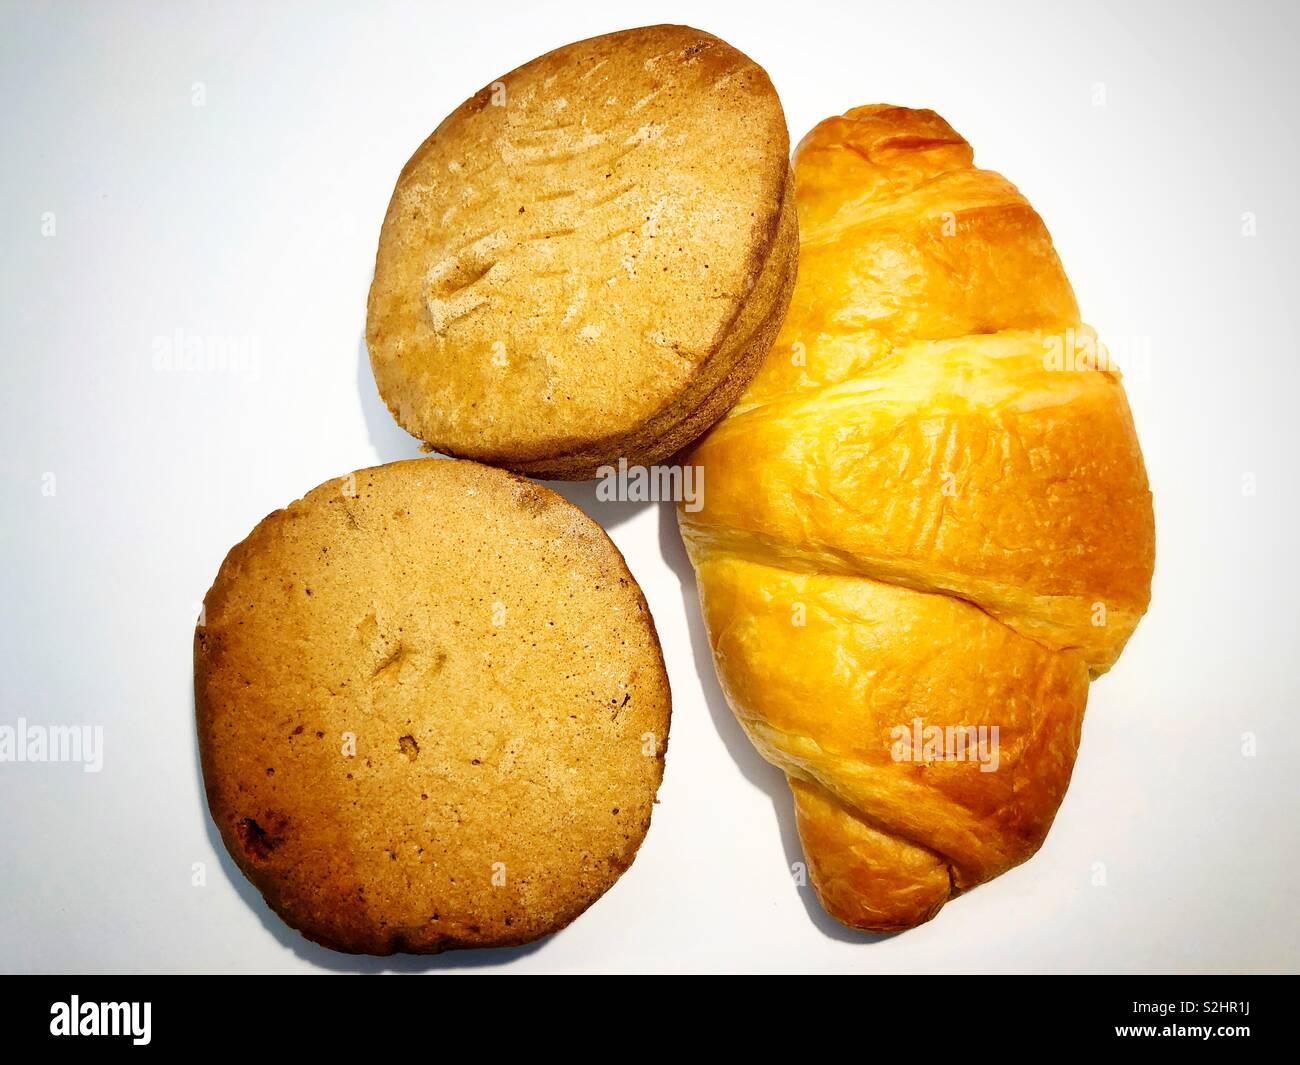 A croissant and mocha mamons - Stock Image